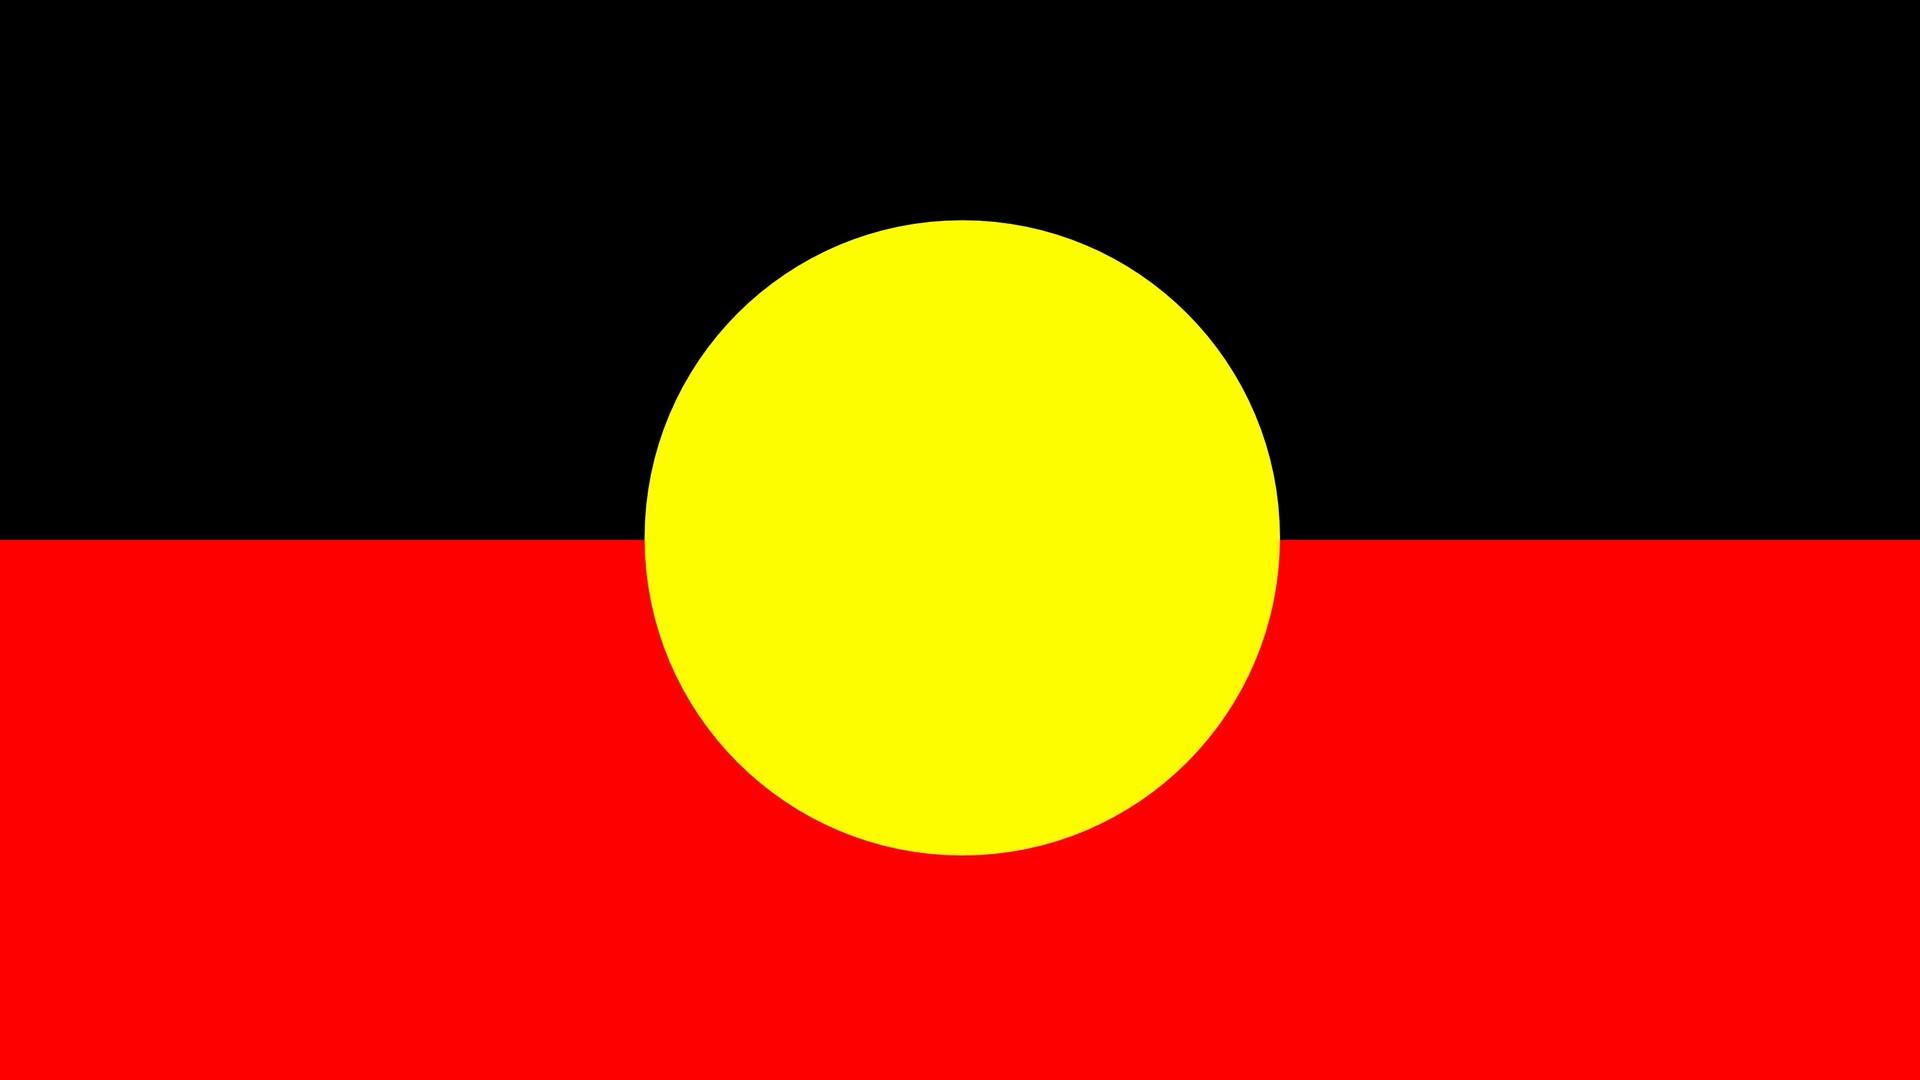 Australian aboriginal flag wallpaper 1920x1080